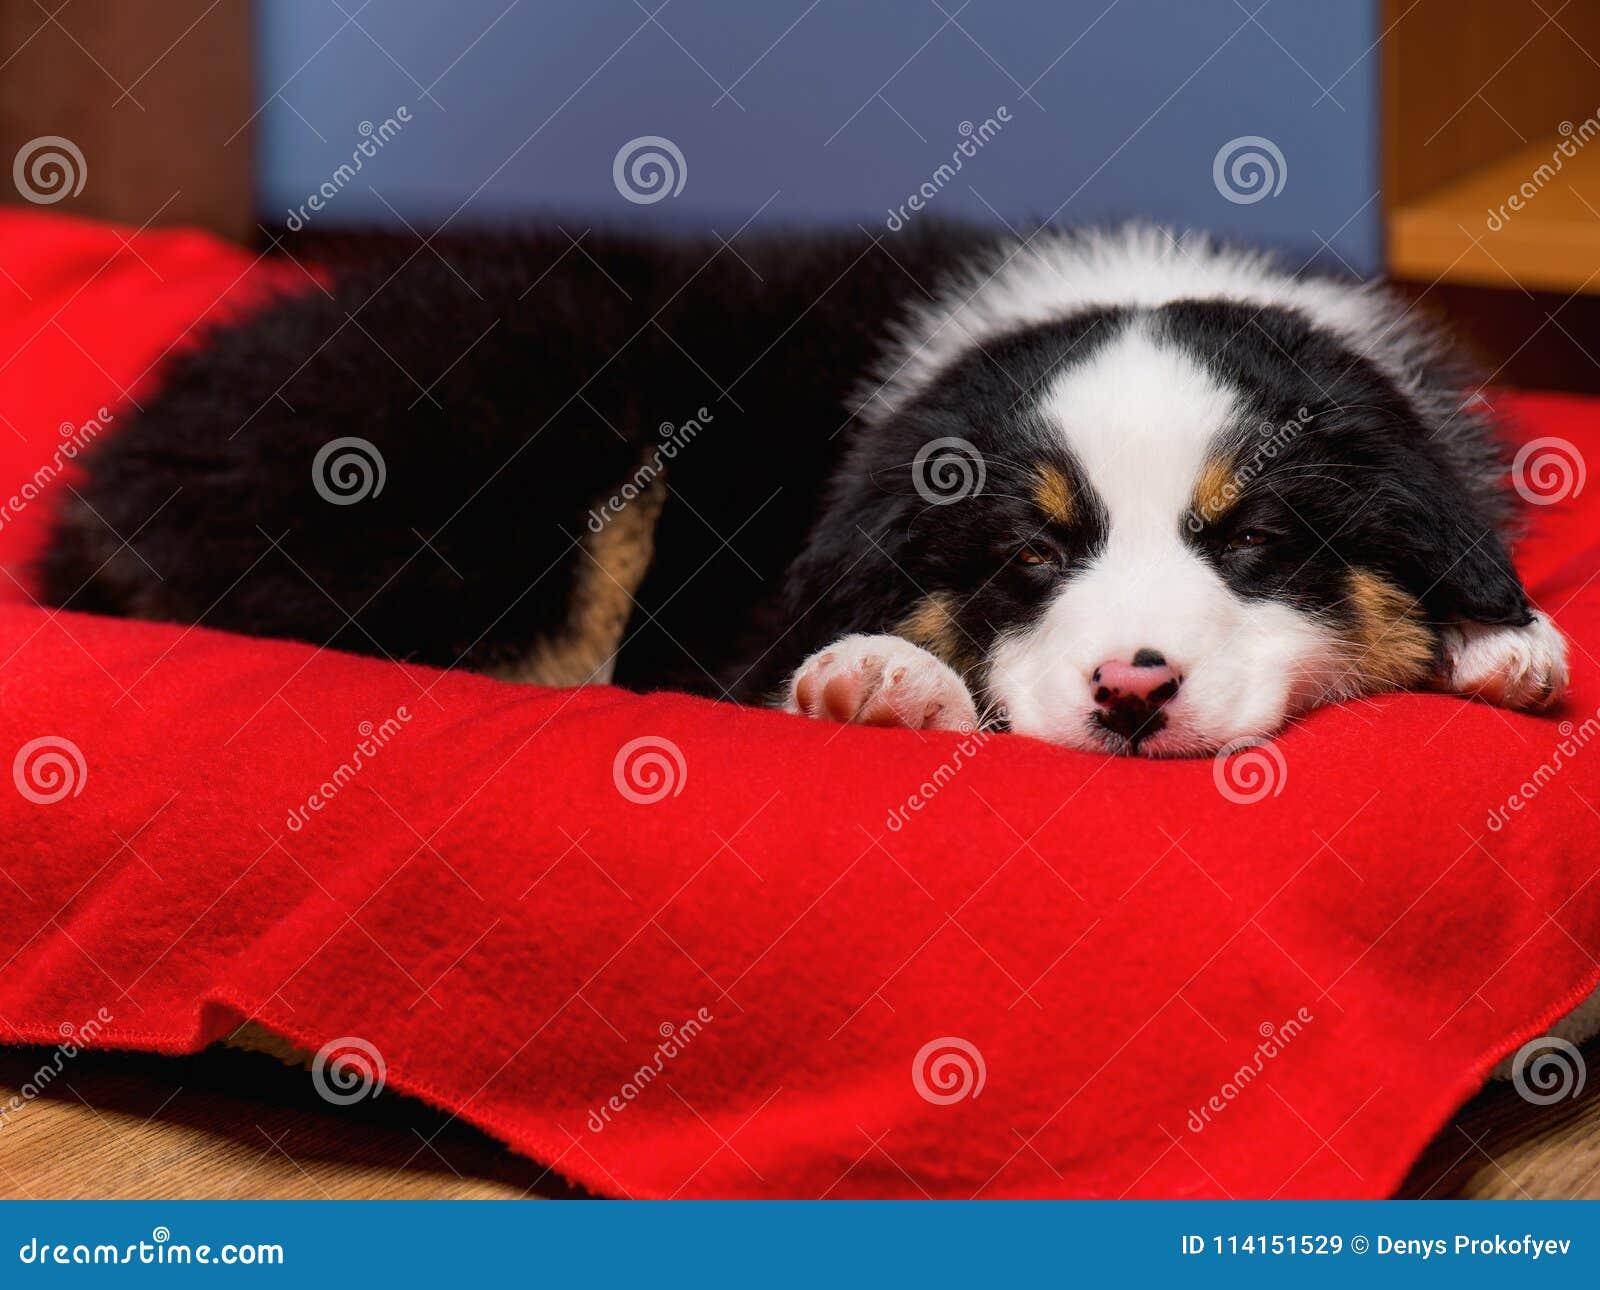 Australian Shepherd Puppy Stock Image Image Of Black 114151529